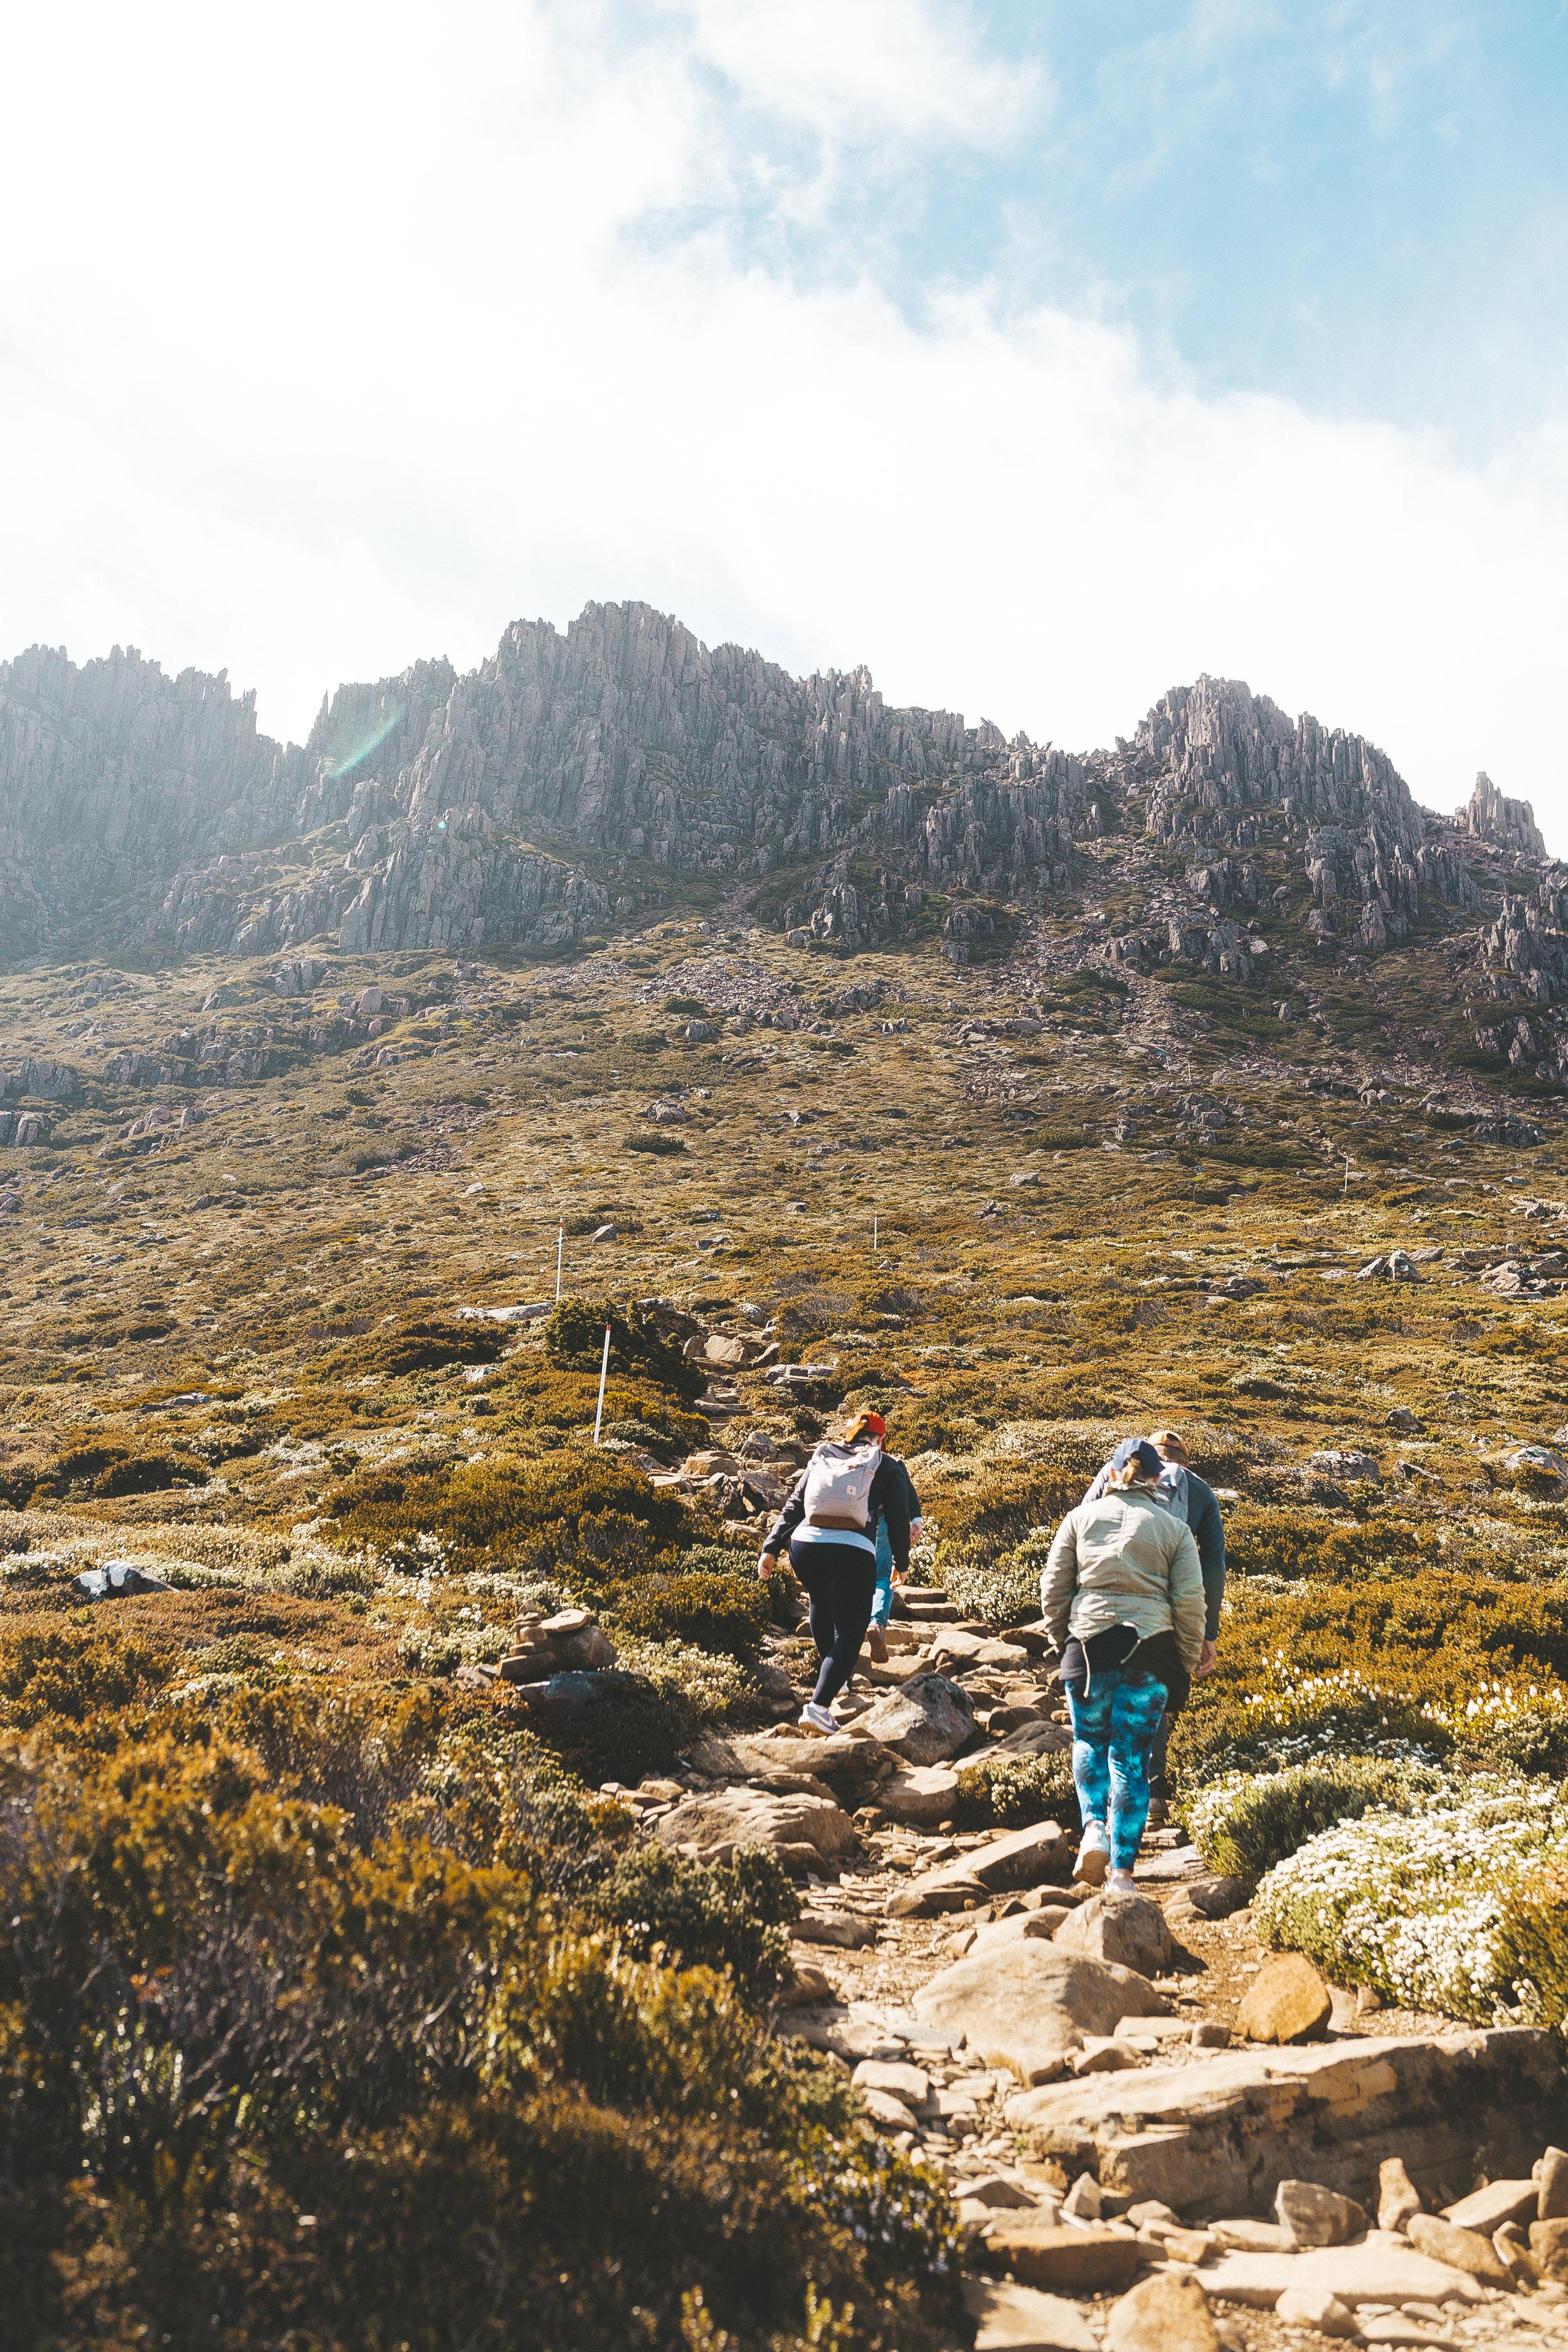 cradle mountain summit hike review tasmania-25.jpg